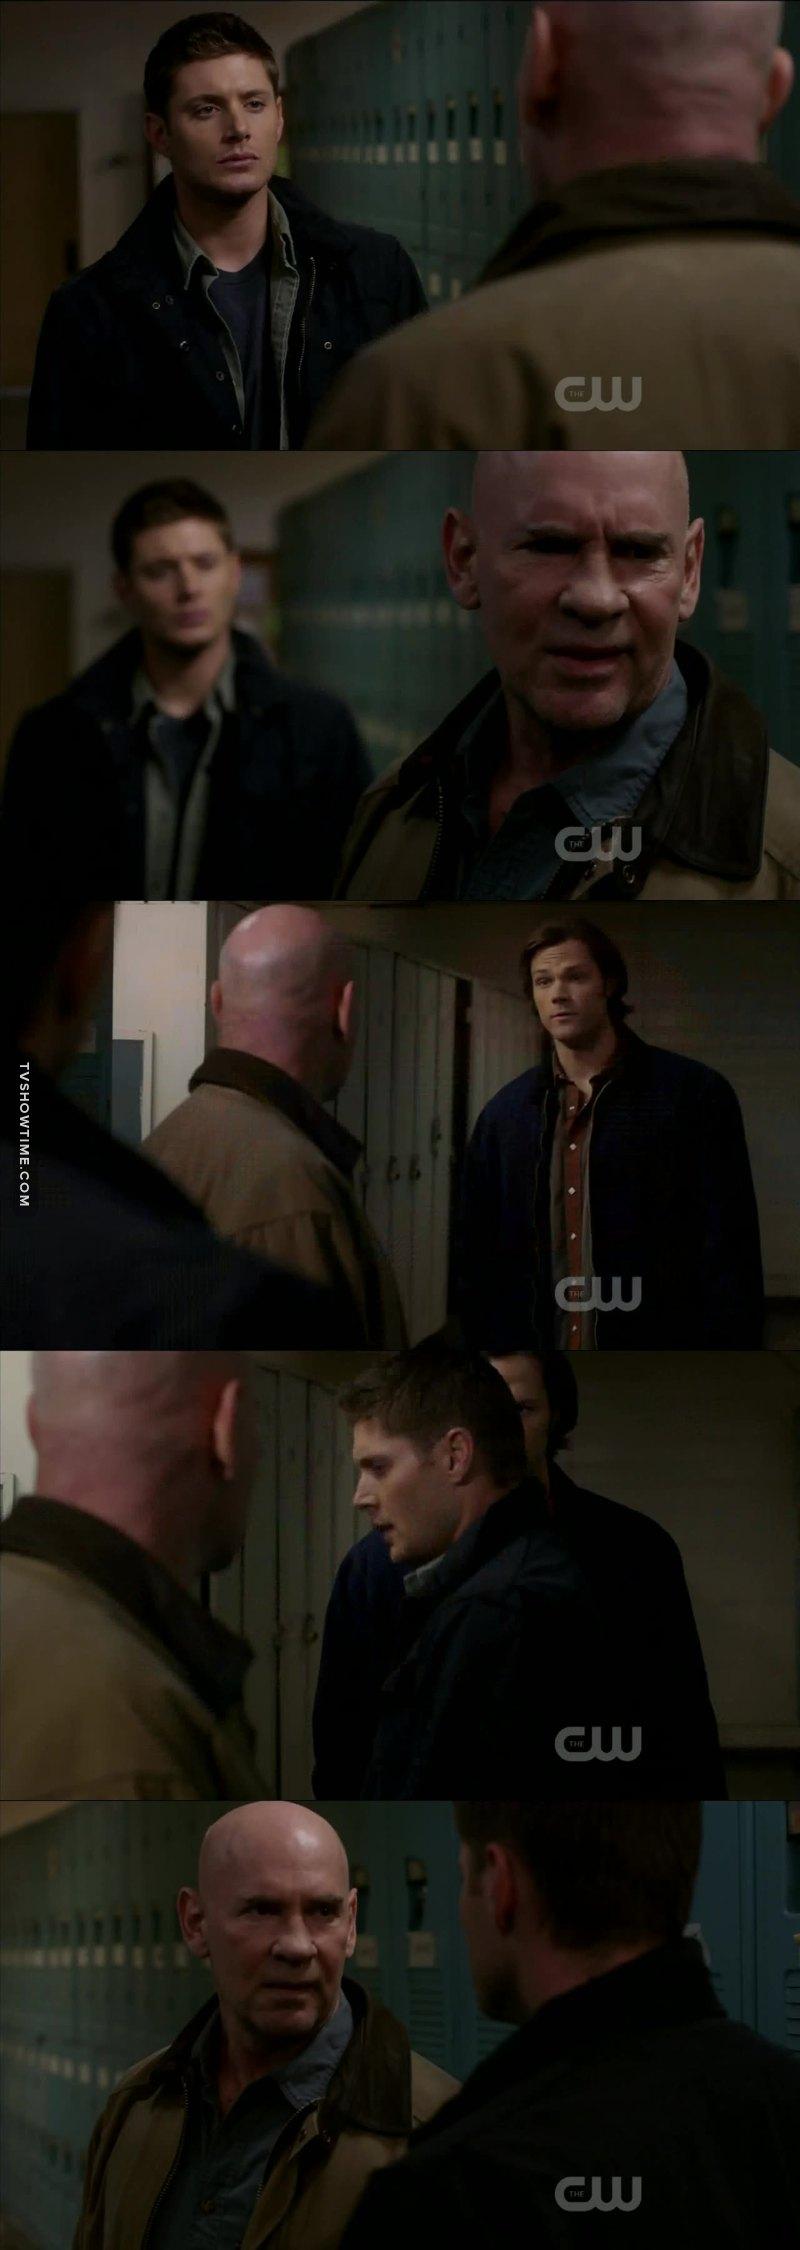 I love overprotective Dean, he was so cute defending Sammy😍